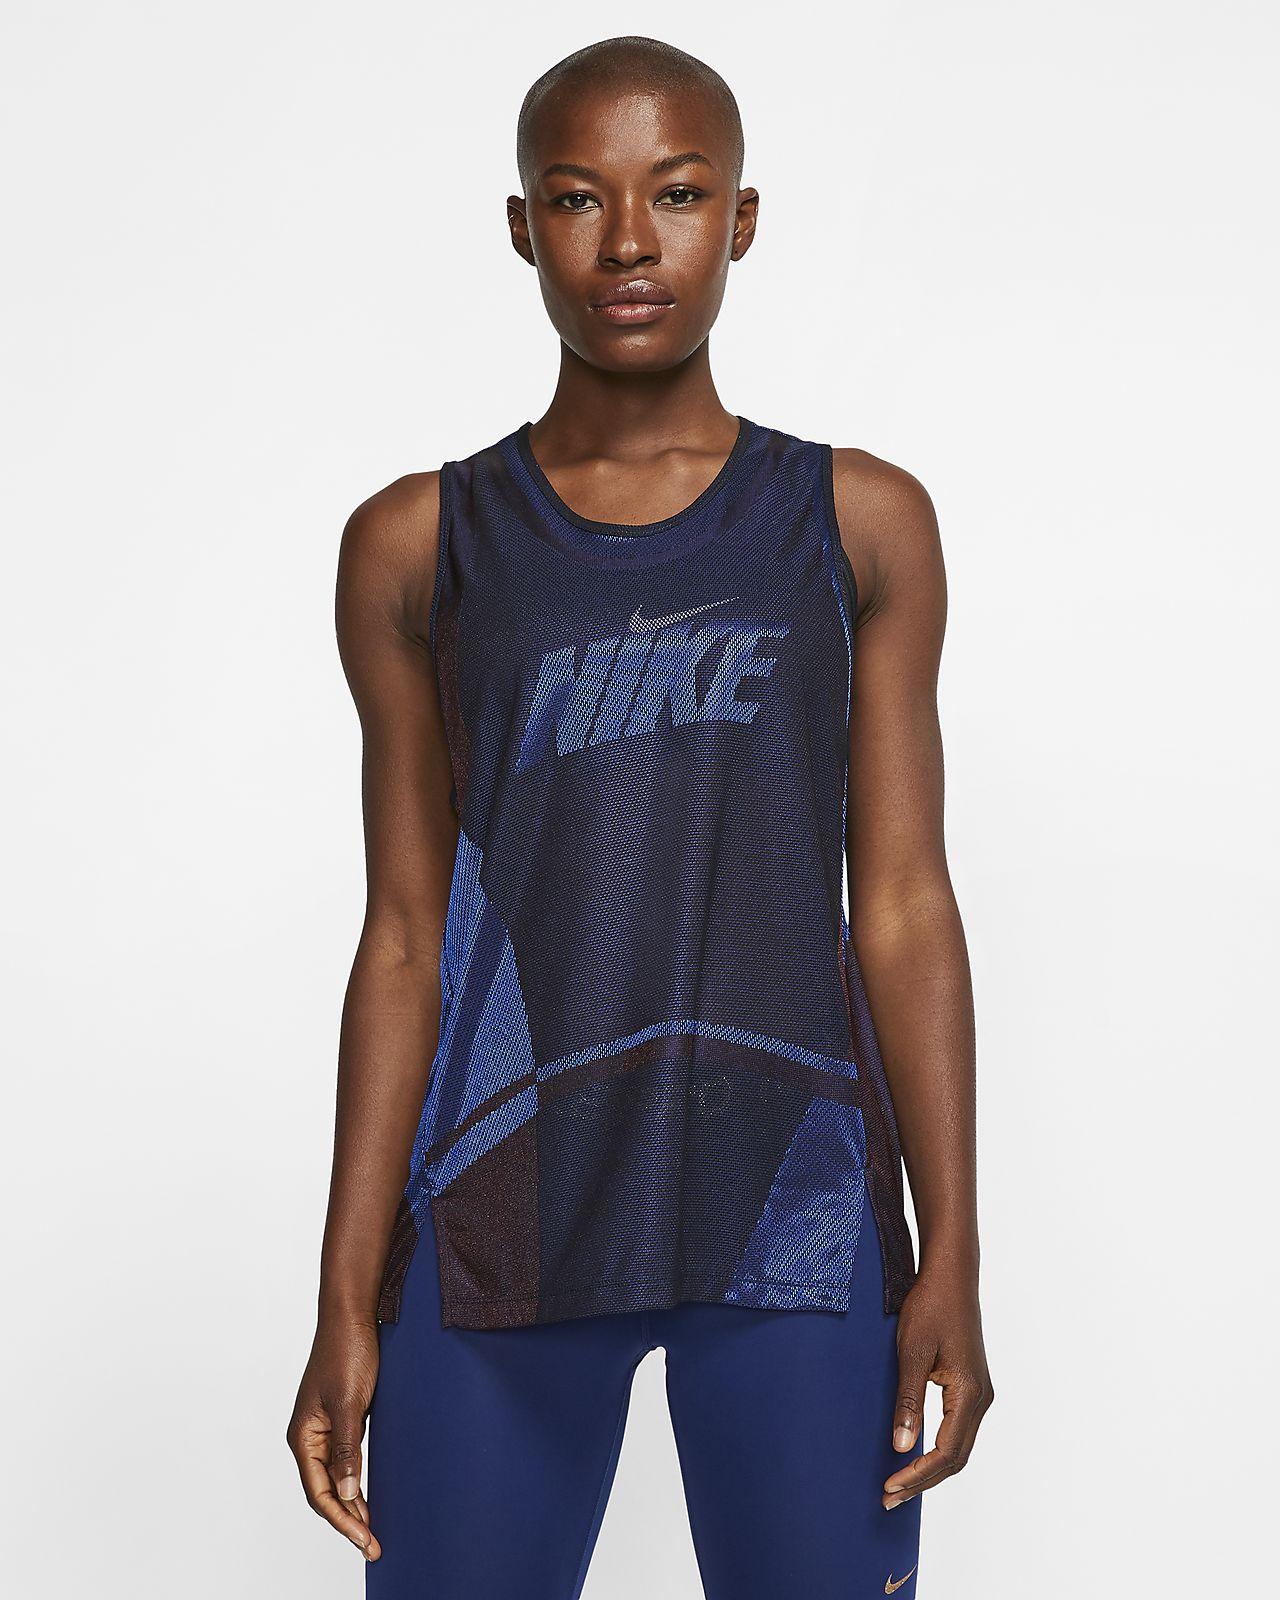 Damska koszulka treningowa bez rękawów Nike Icon Clash